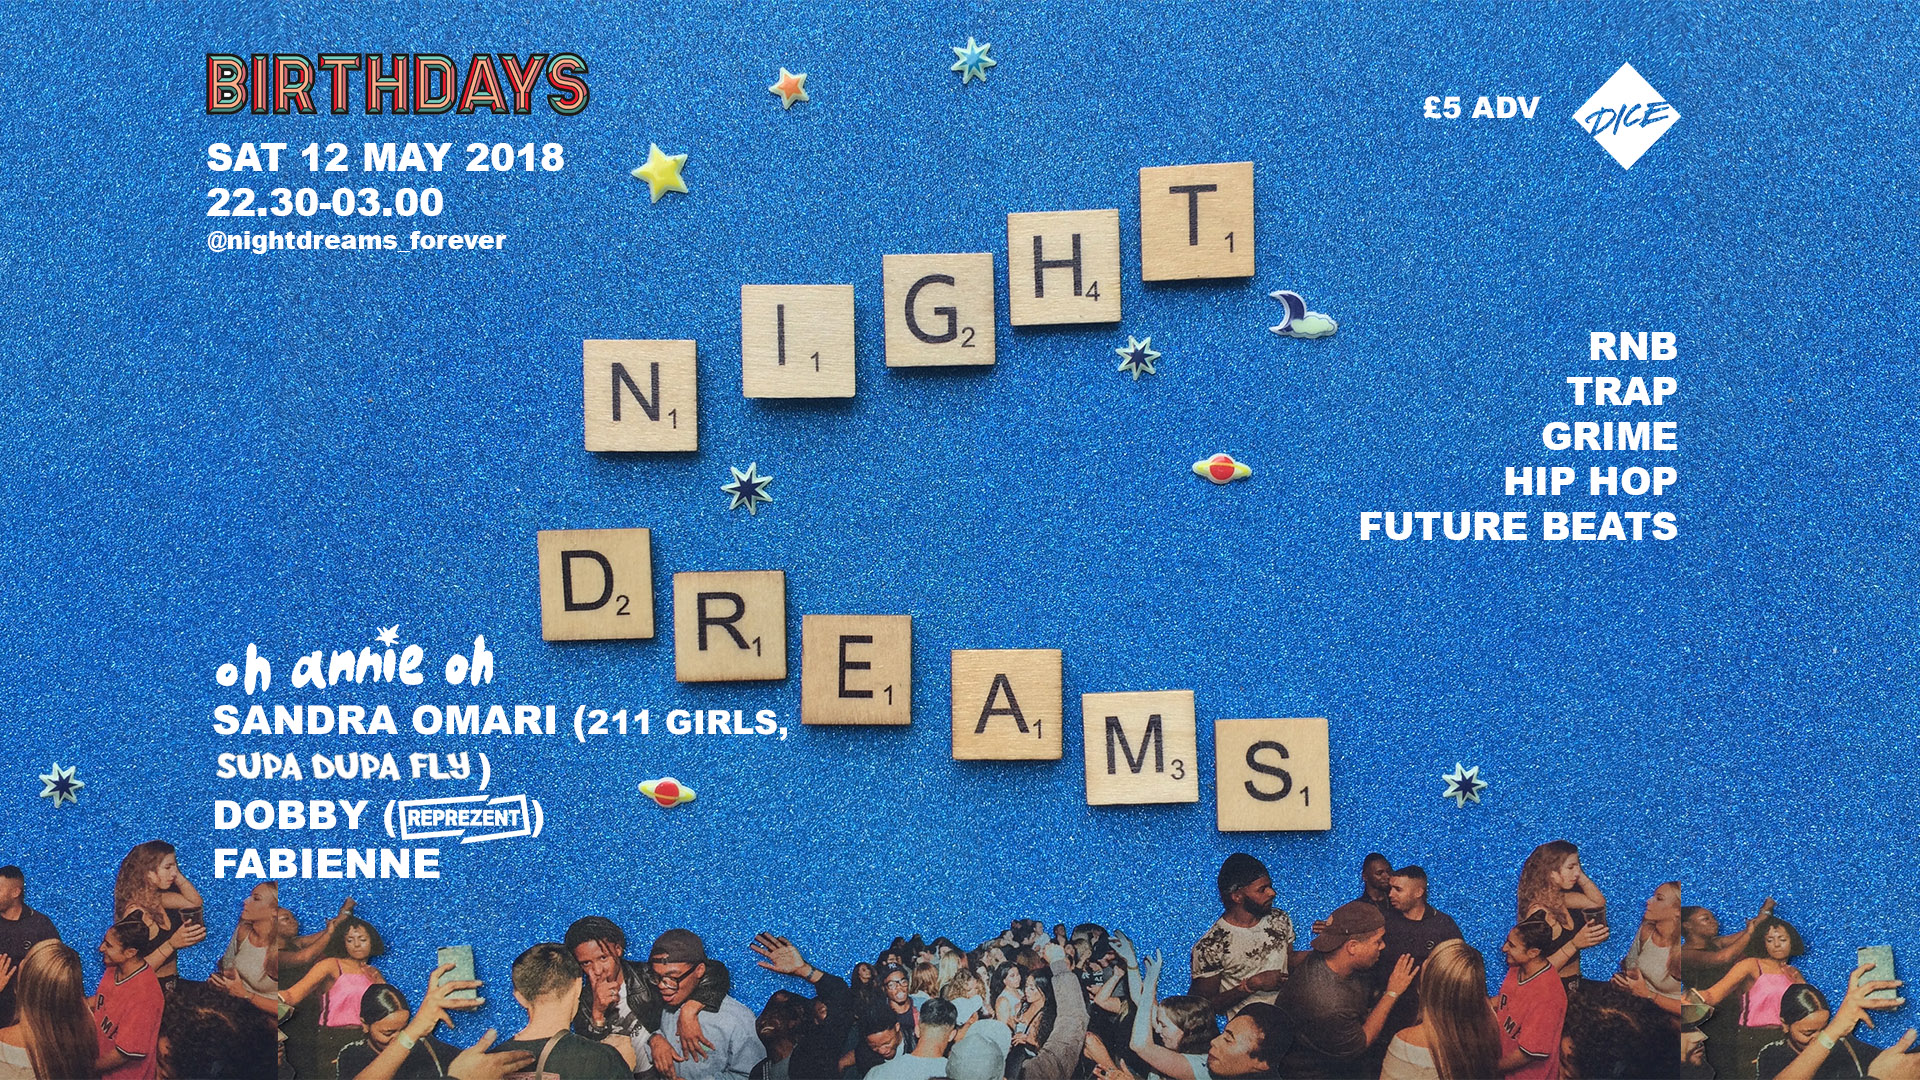 NIGHT DREAMS 22 LANDSCAPE.jpg